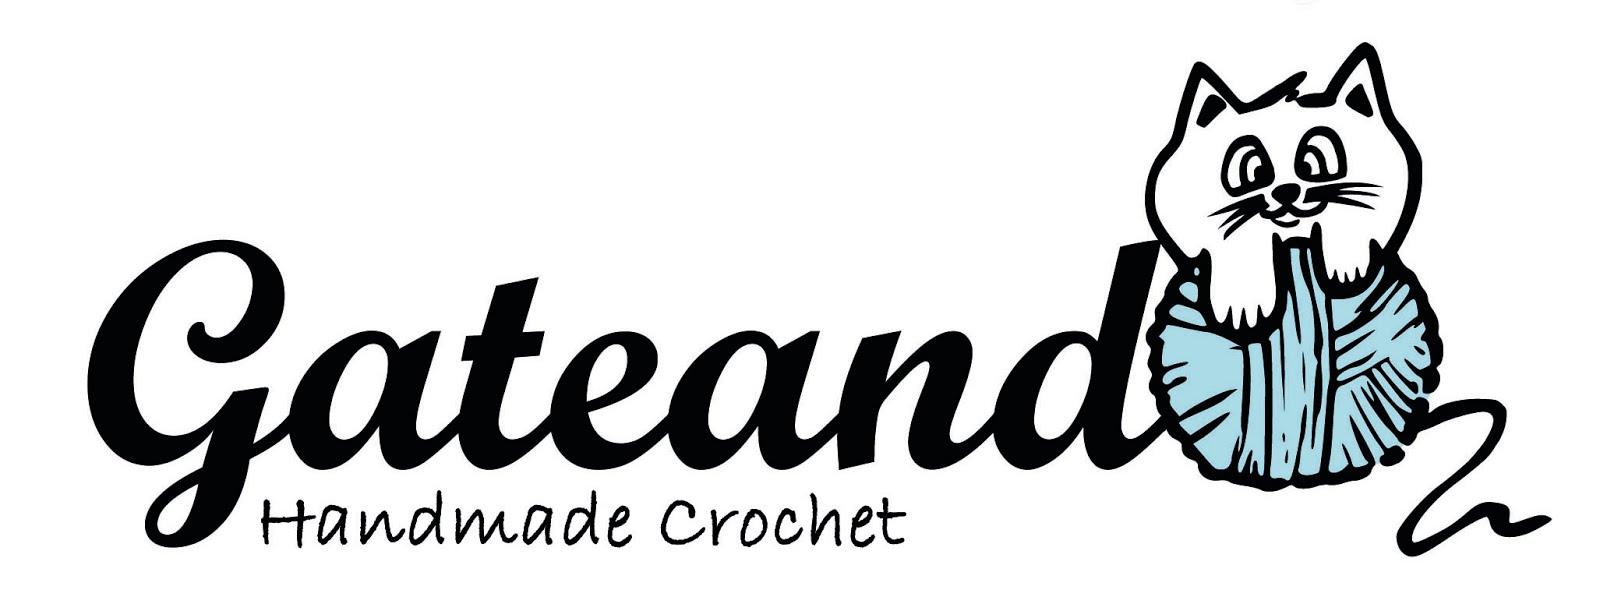 Gateando Crochet